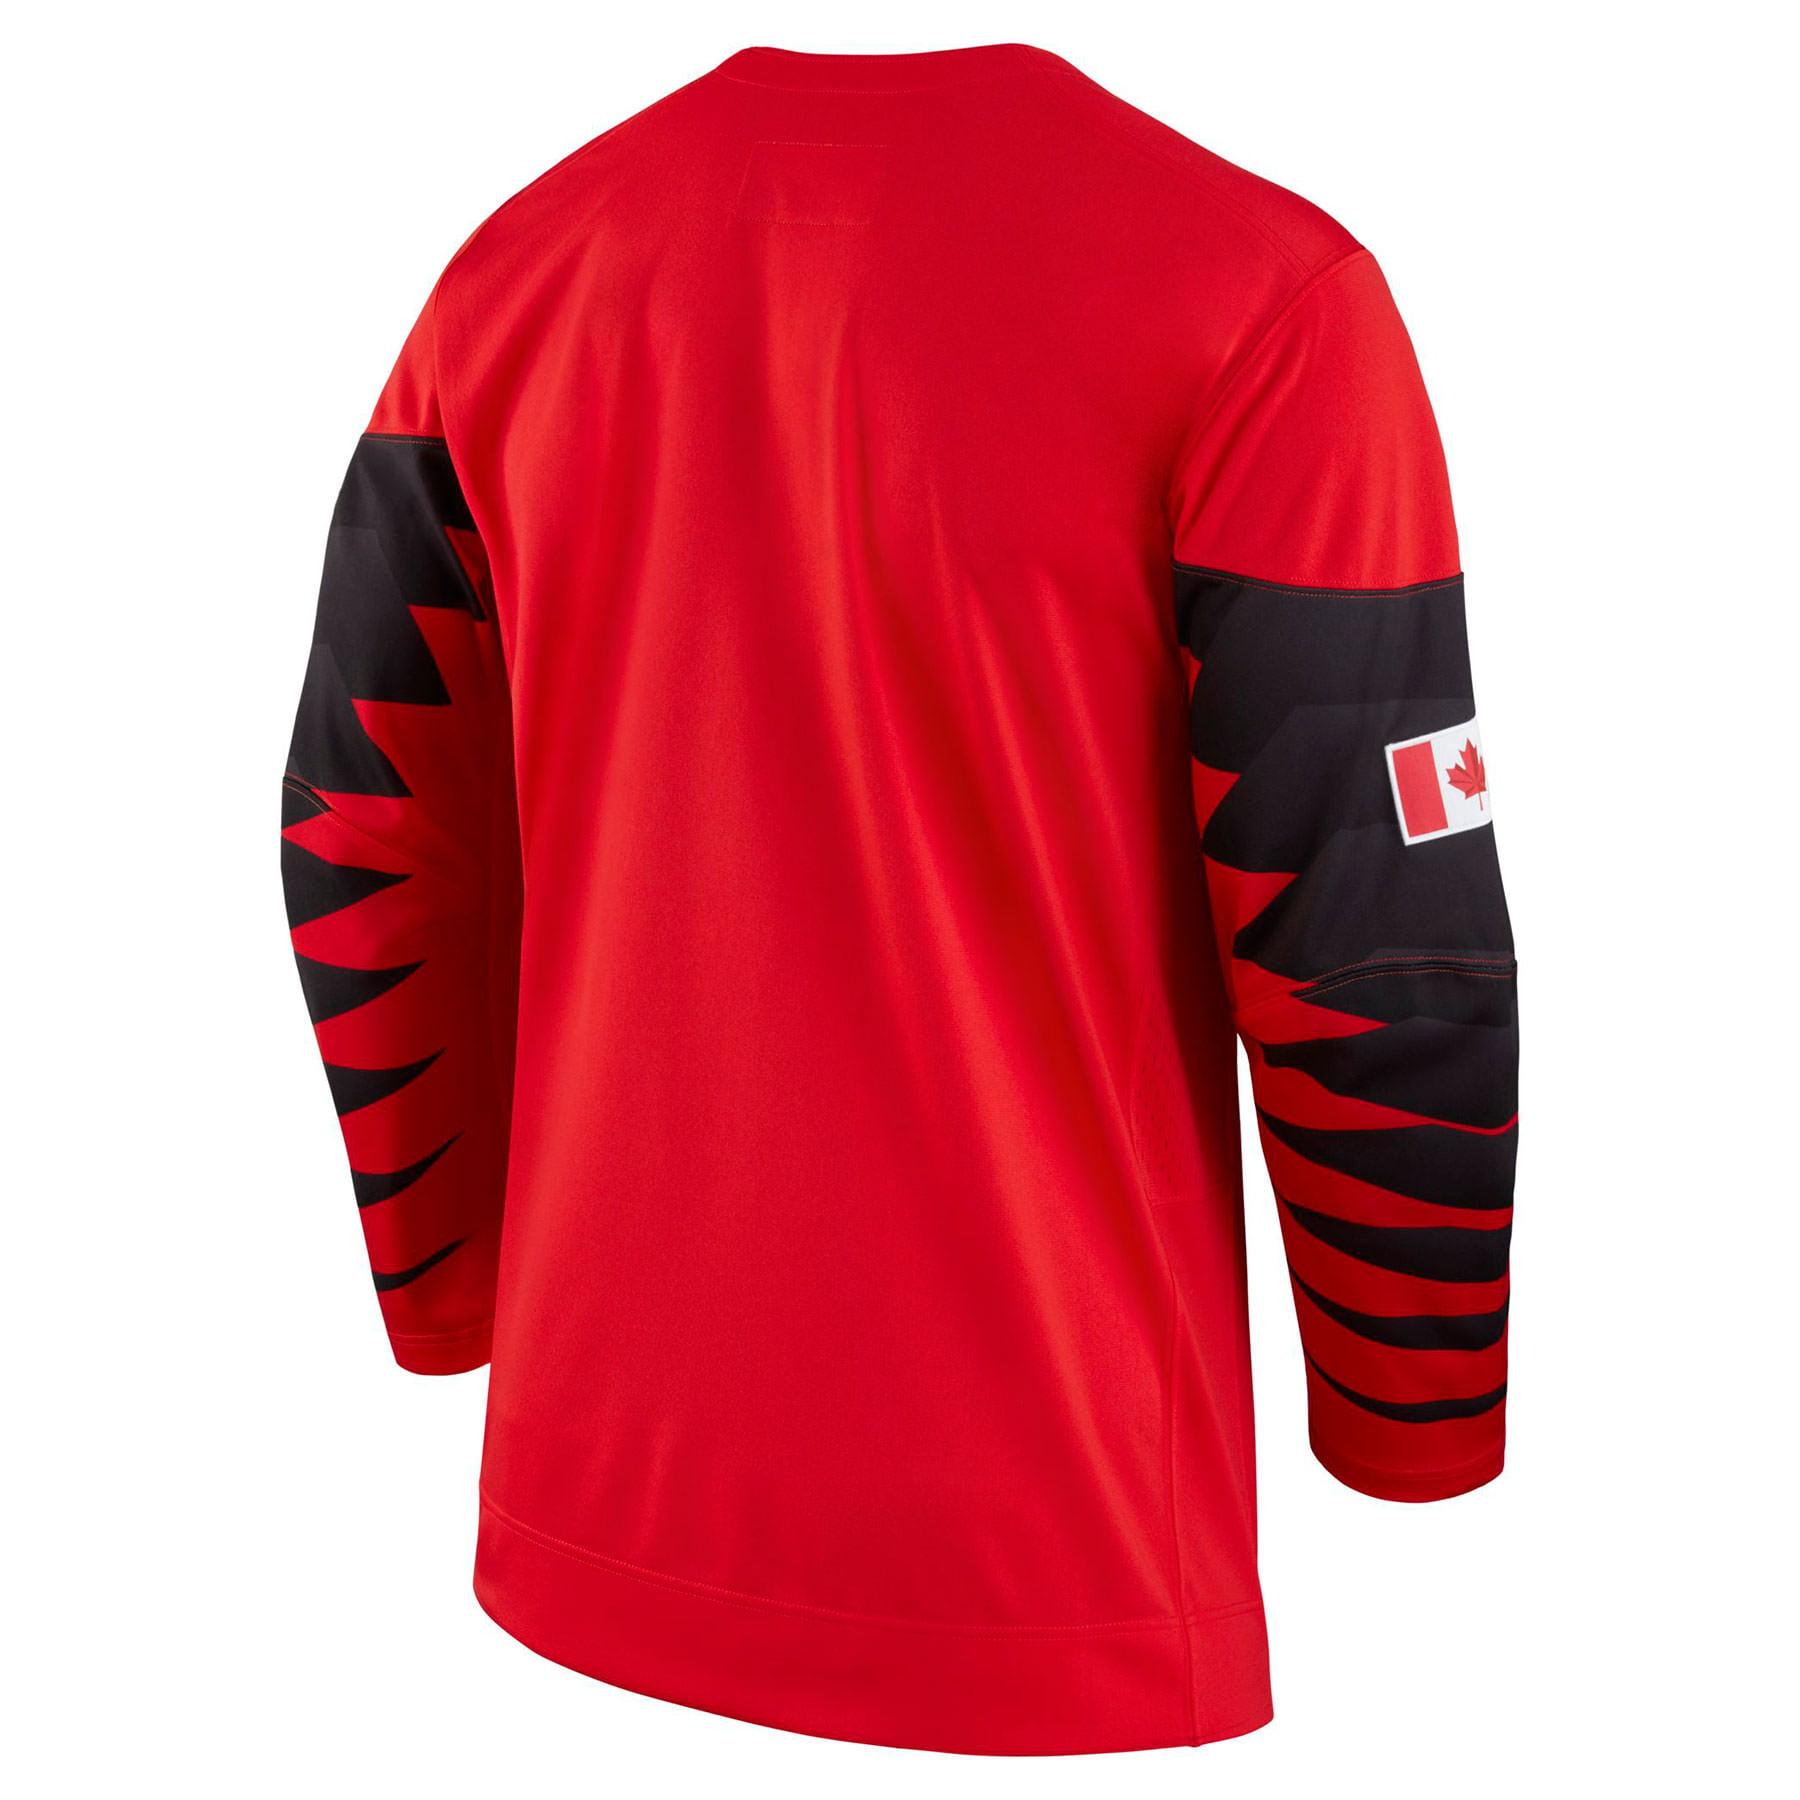 167963c0654 Nike Team Canada Nike 2018 Olympic Red Hockey Jersey